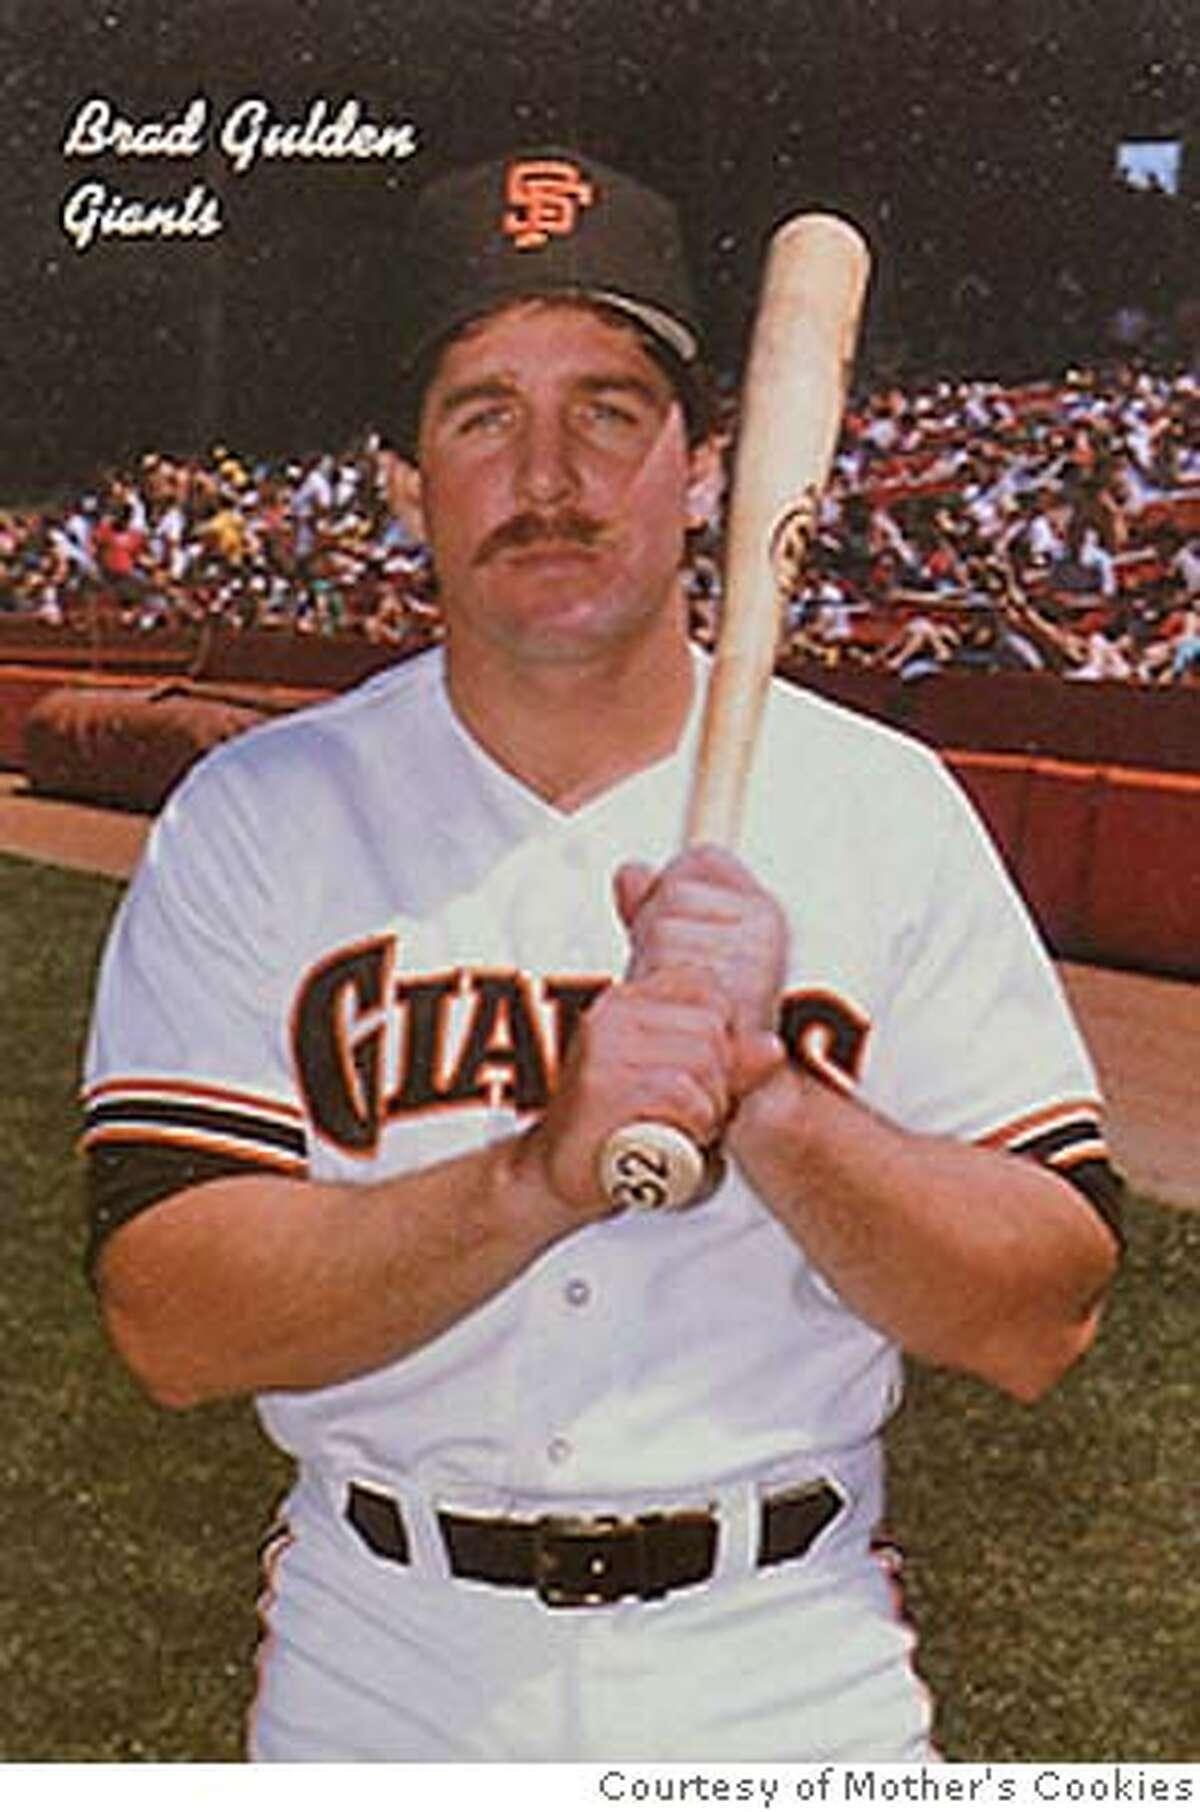 Brad Gulden, Giants, on 1986 Mother's Cookies baseball card. Credit: Mother's Cookies